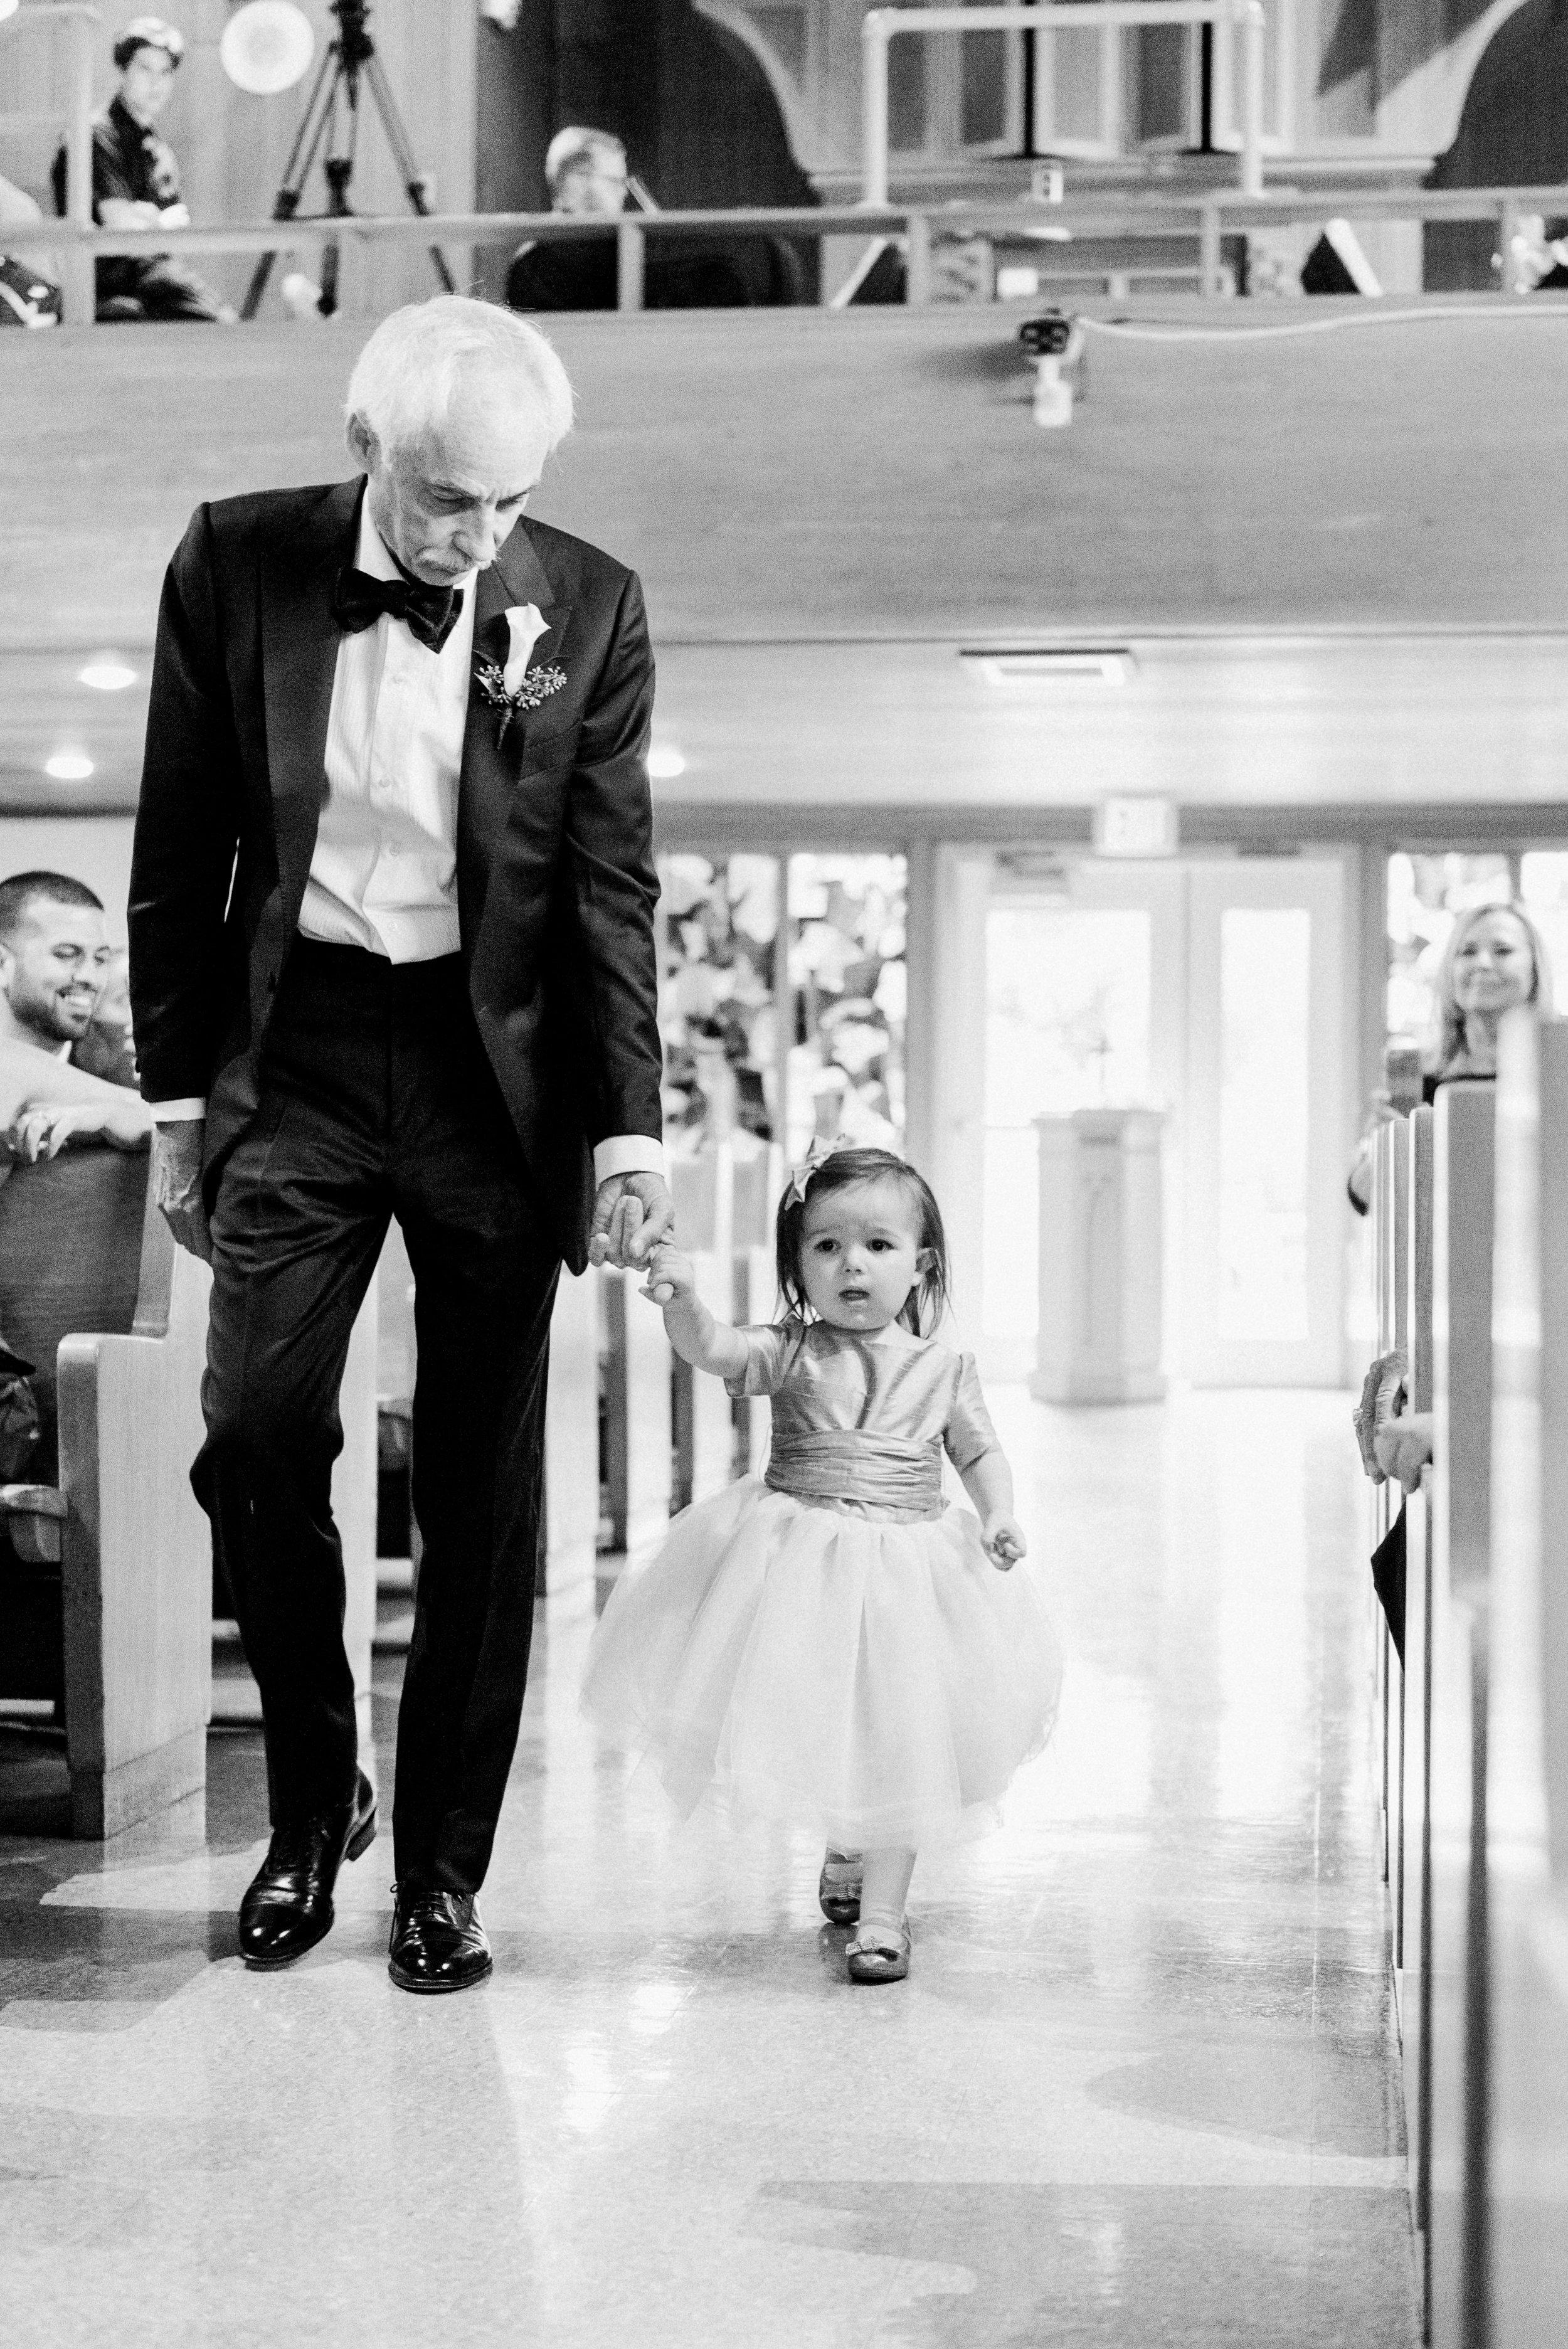 DavidAmandaMundy-Wedding-10282017-KathrynIvyPhotography-169.jpg